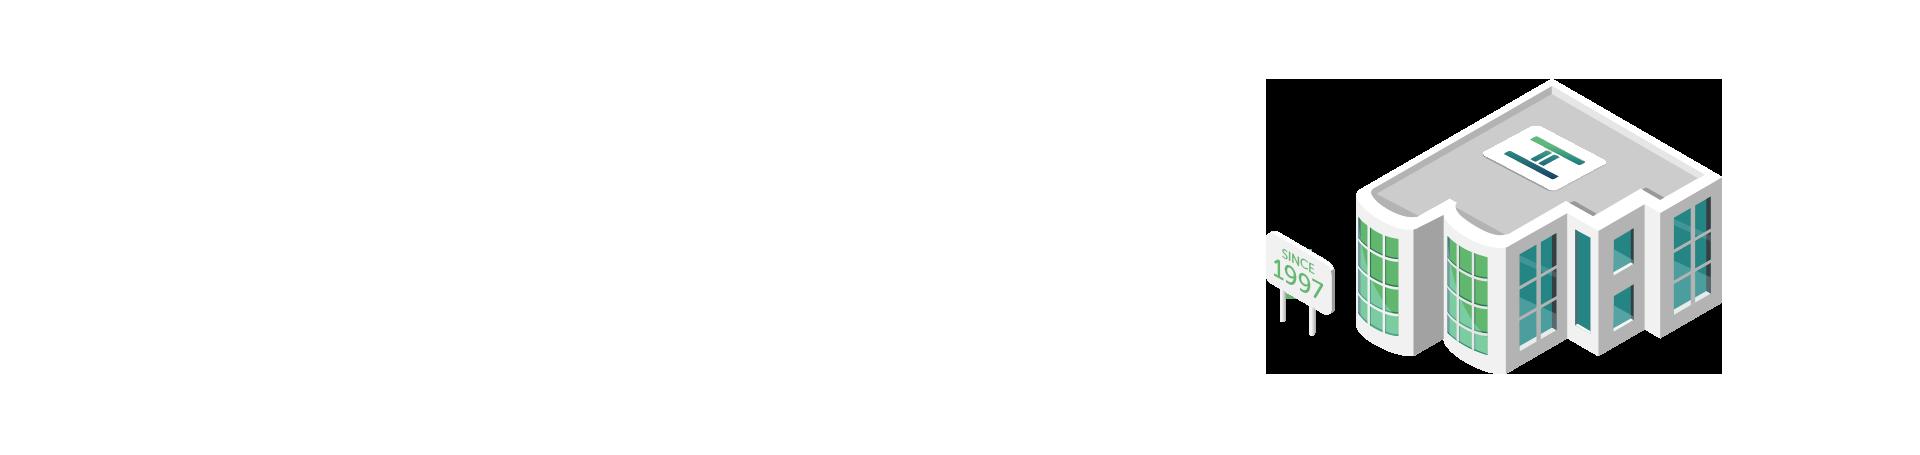 190228 HE PTL HeaderImage Unternehmen